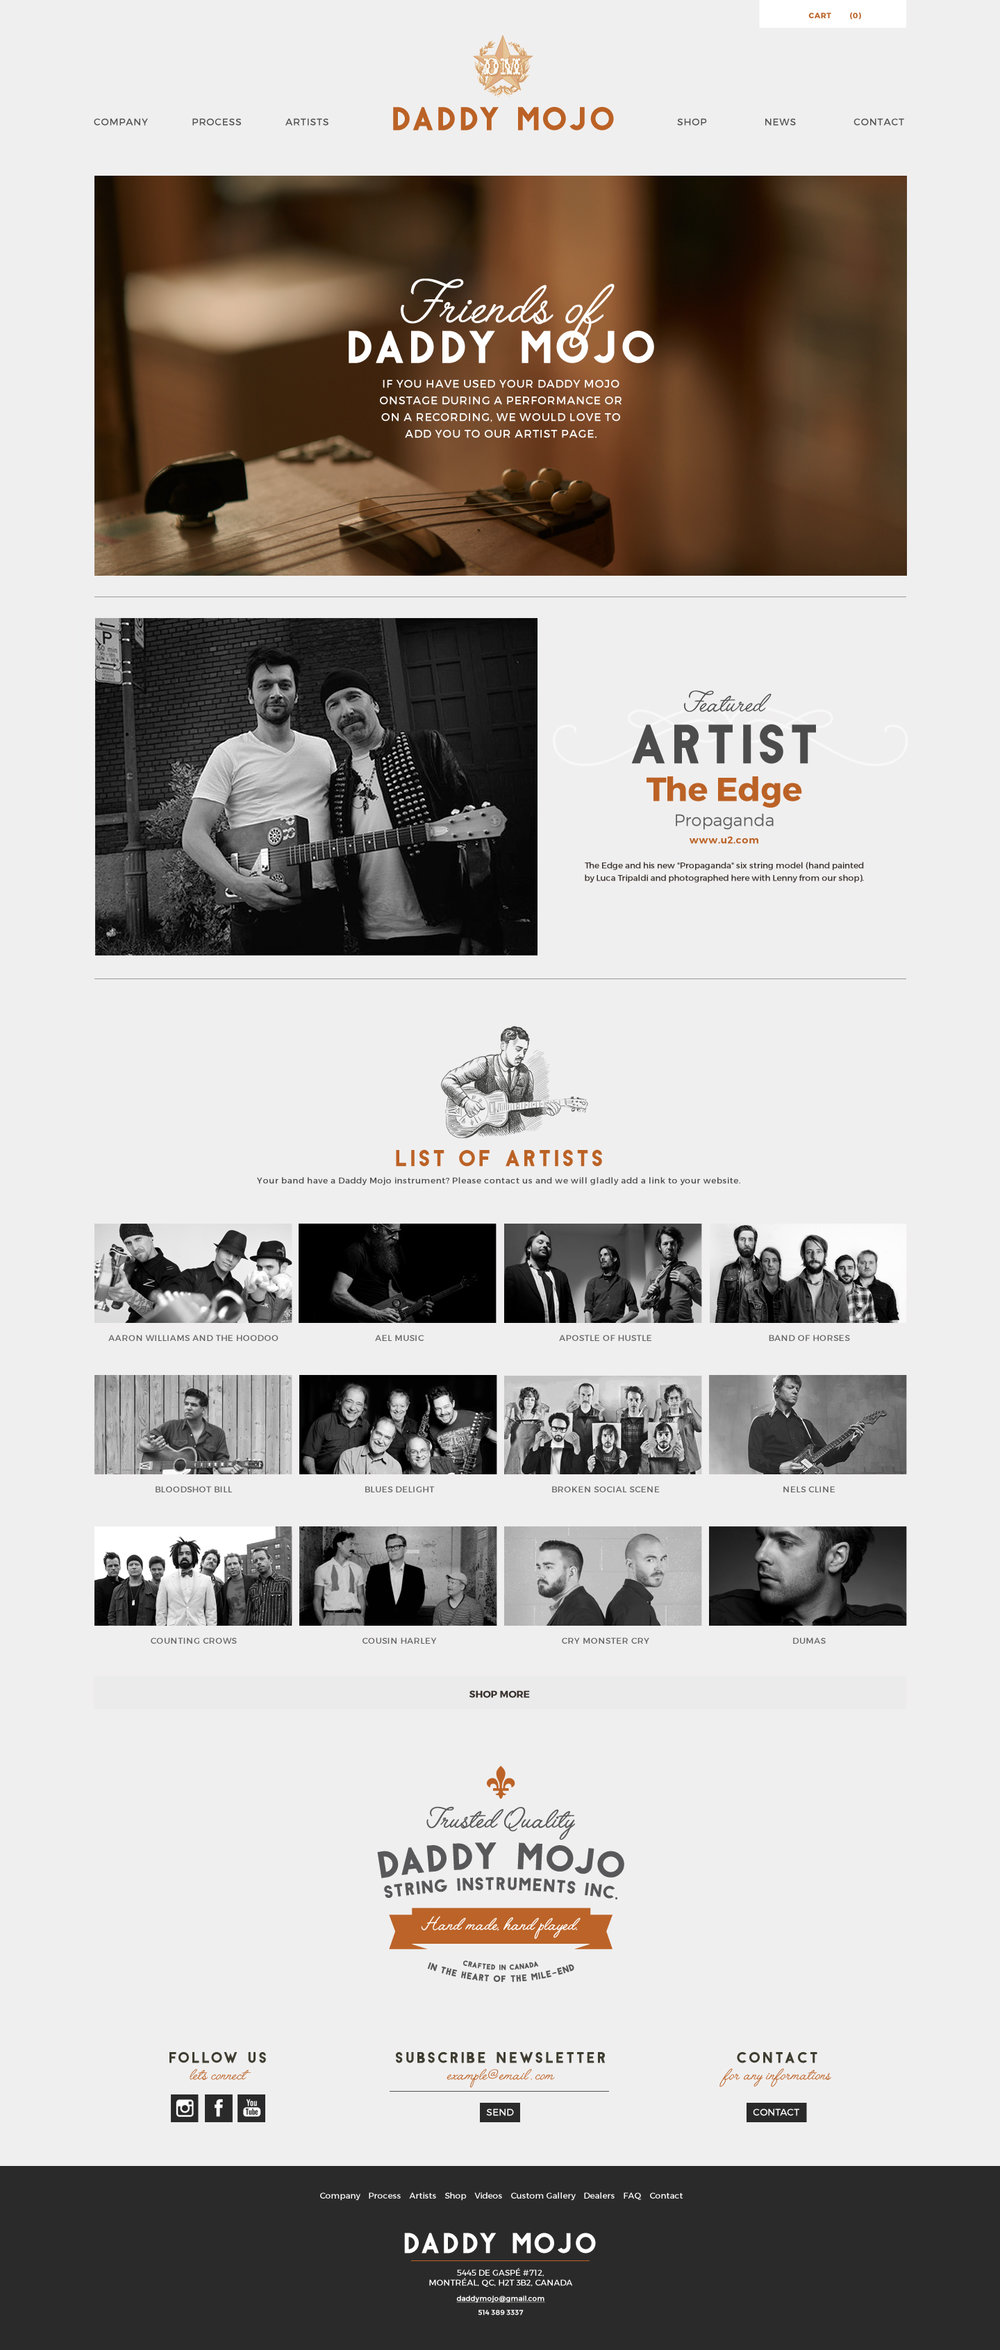 1200 - artists - Daddy Mojo_v3.jpg